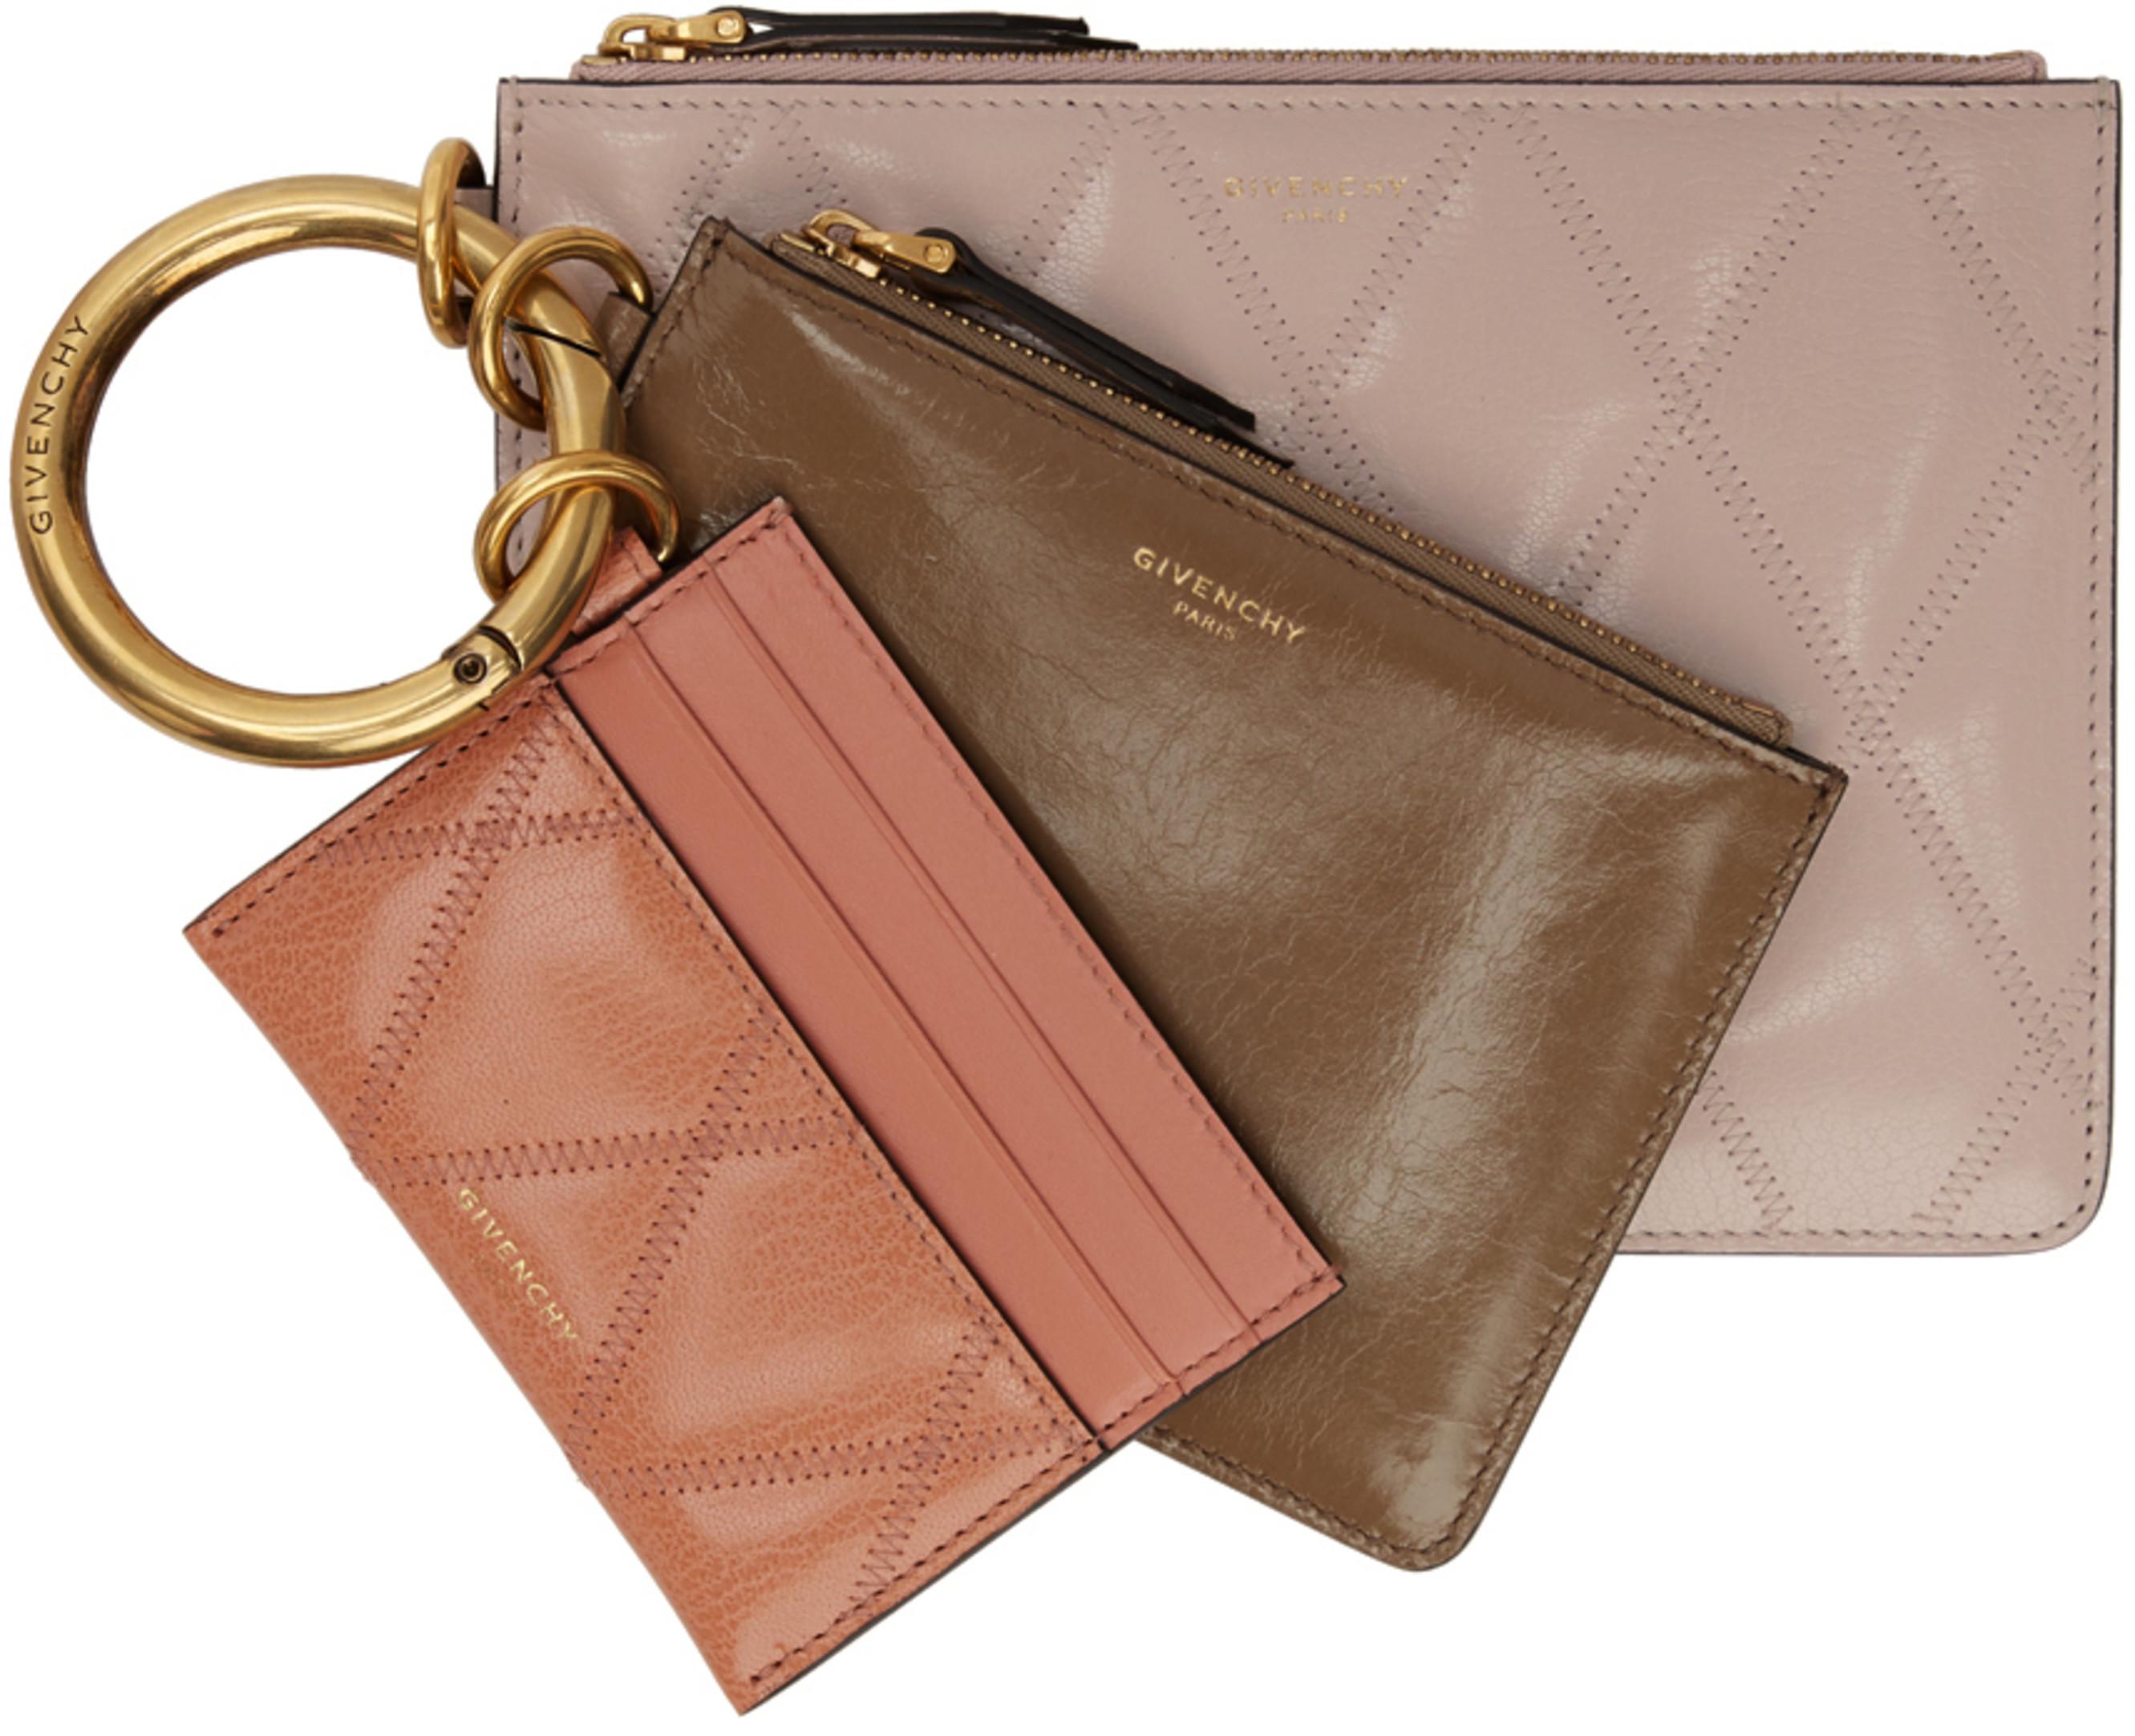 e58403c0d57 Givenchy bags for Women   SSENSE